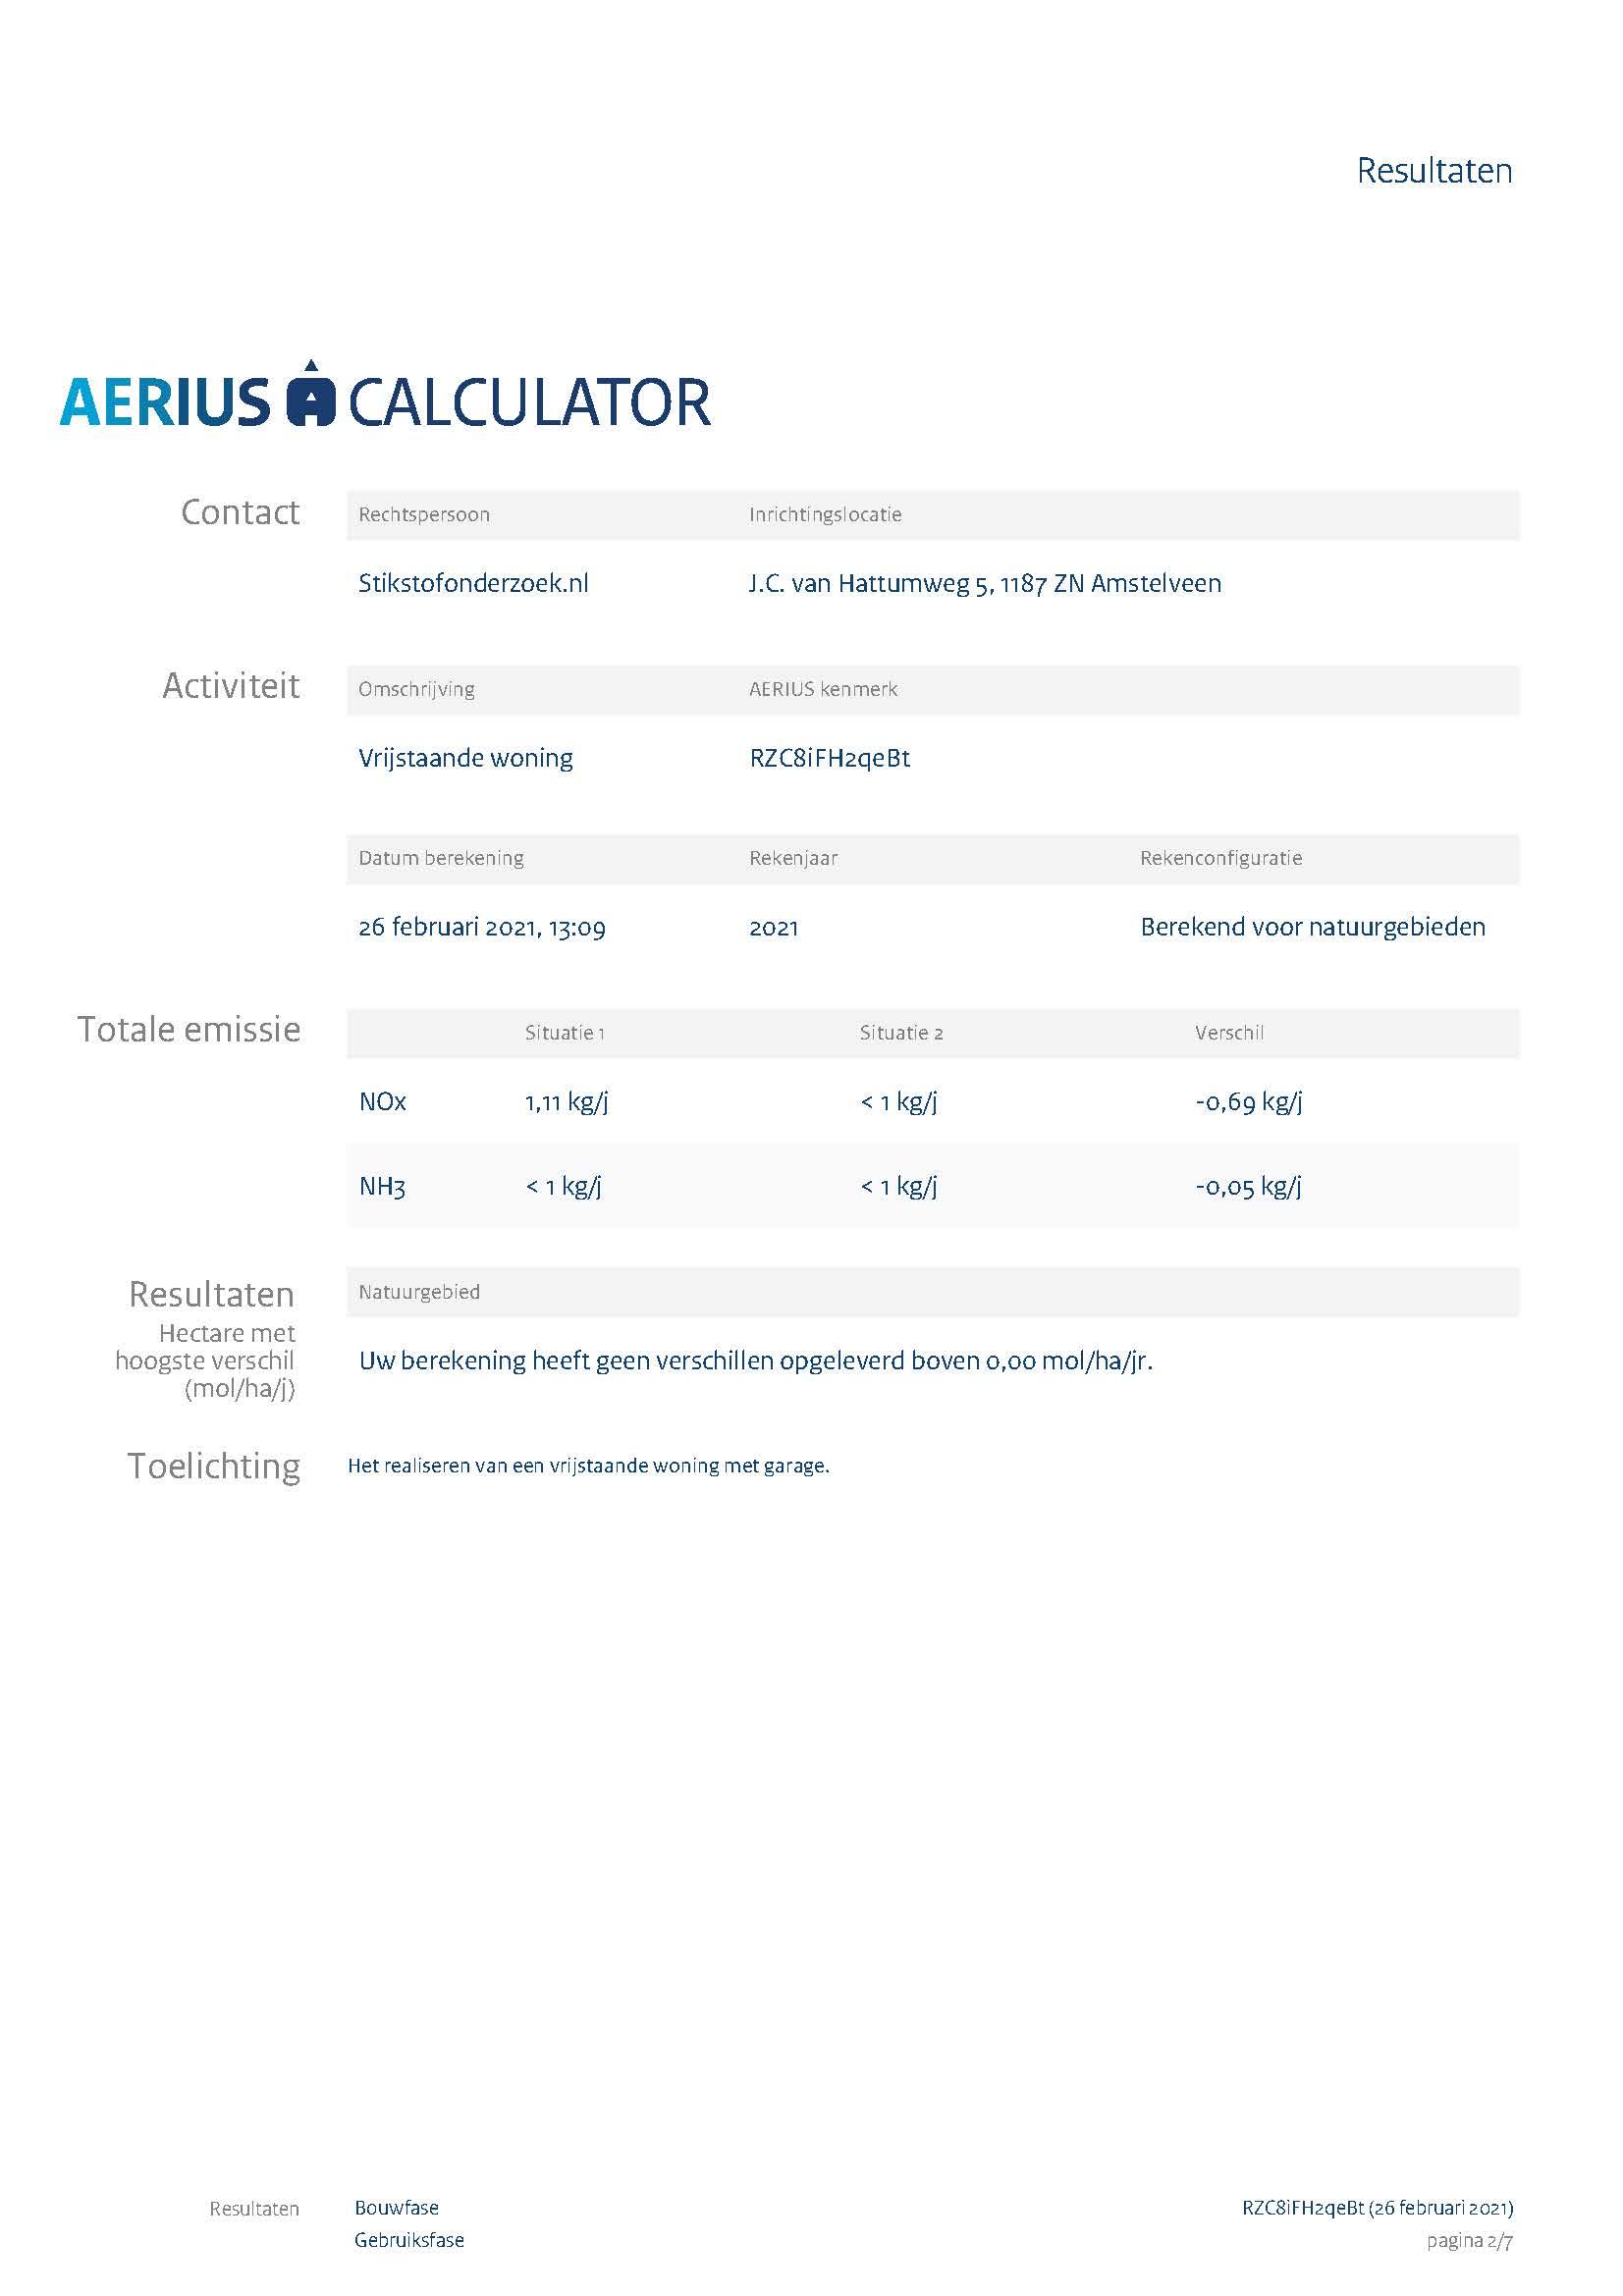 stikstofonderzoek voorbeeldplan aerius berekening page 2